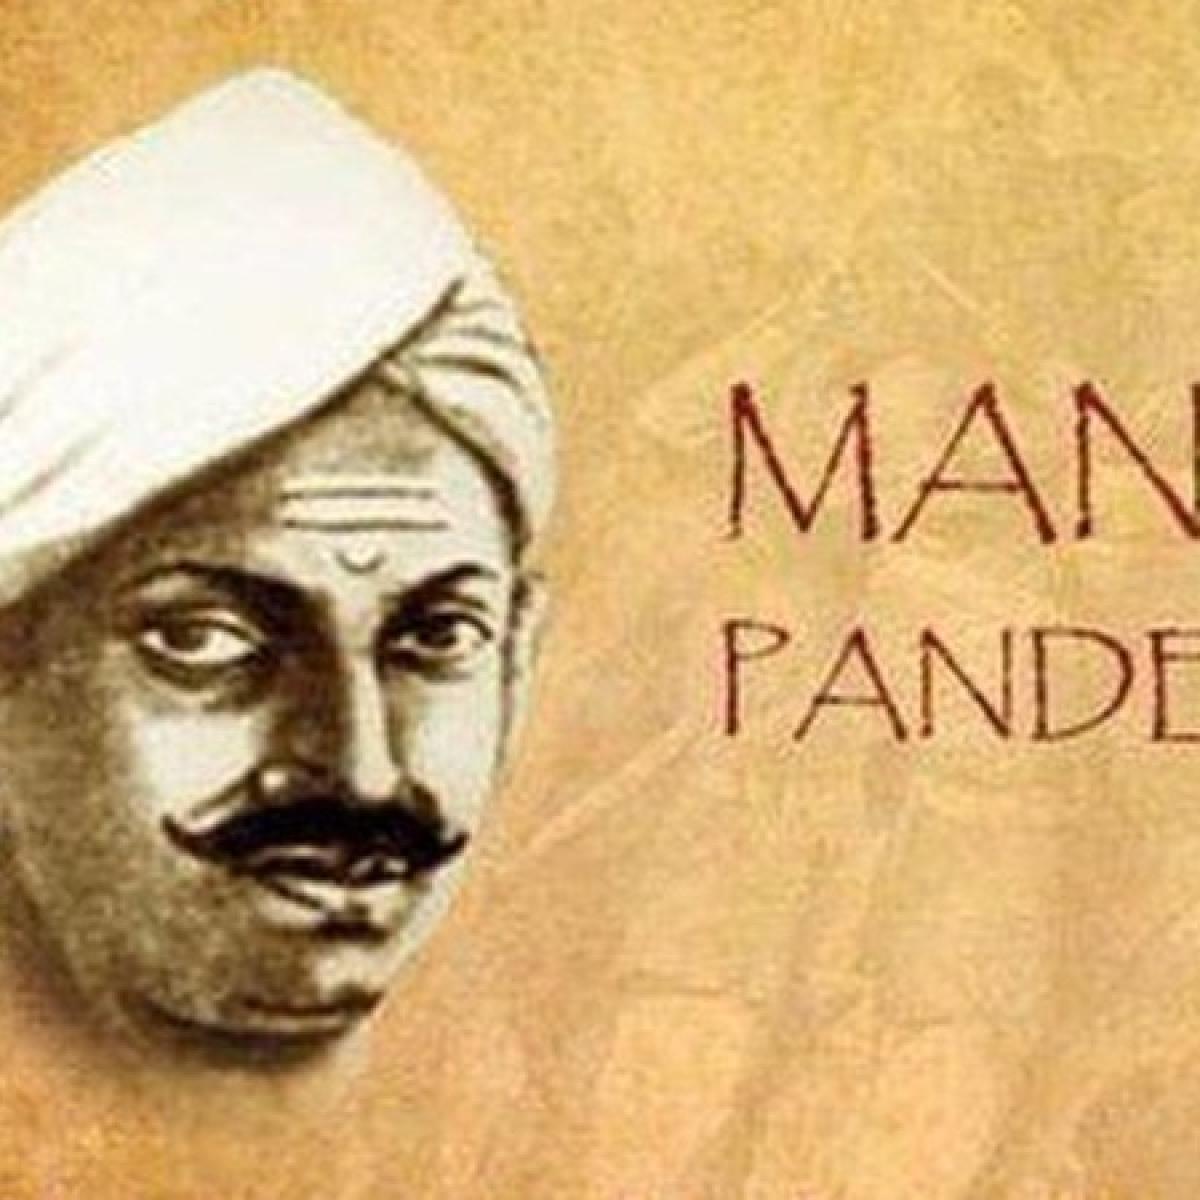 LS Speaker Om Birla, JP Nadda, Ashok Ghelot, others pay tributes to Mangal Pandey on his 193rd birth anniversary